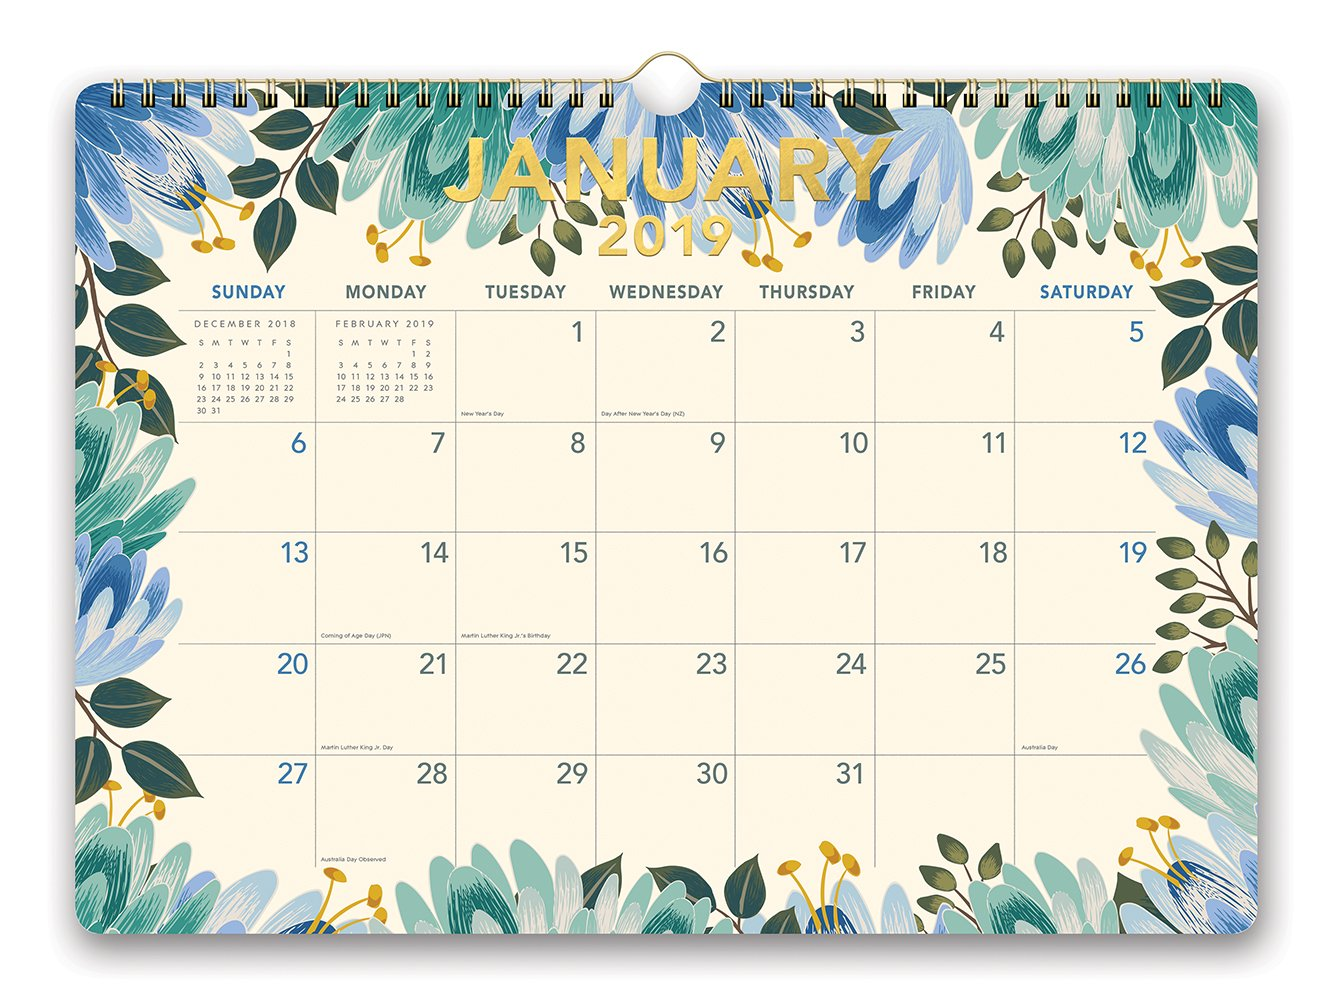 Orange Circle Studio 2019 Deluxe Wall Calendar, August 2018 - December 2019, Flower Power